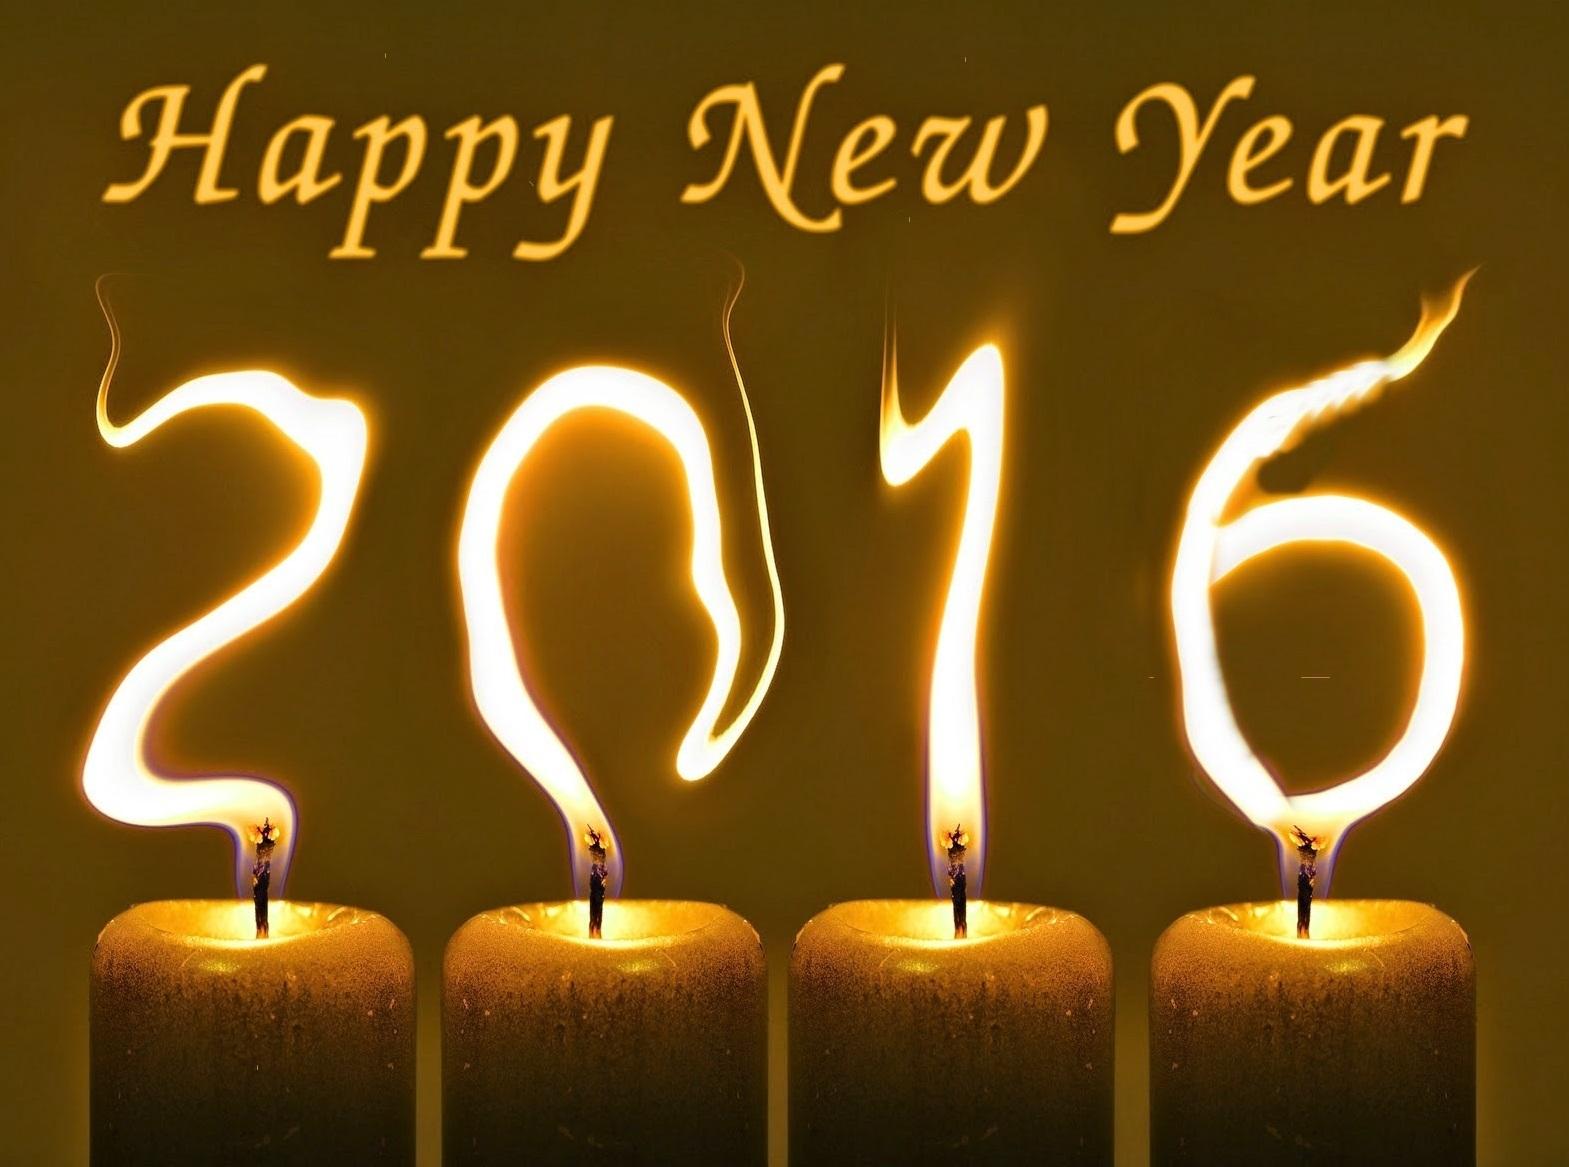 DP BBM Selamat Tahun Baru 2016 Keren Warkop Aimaaan